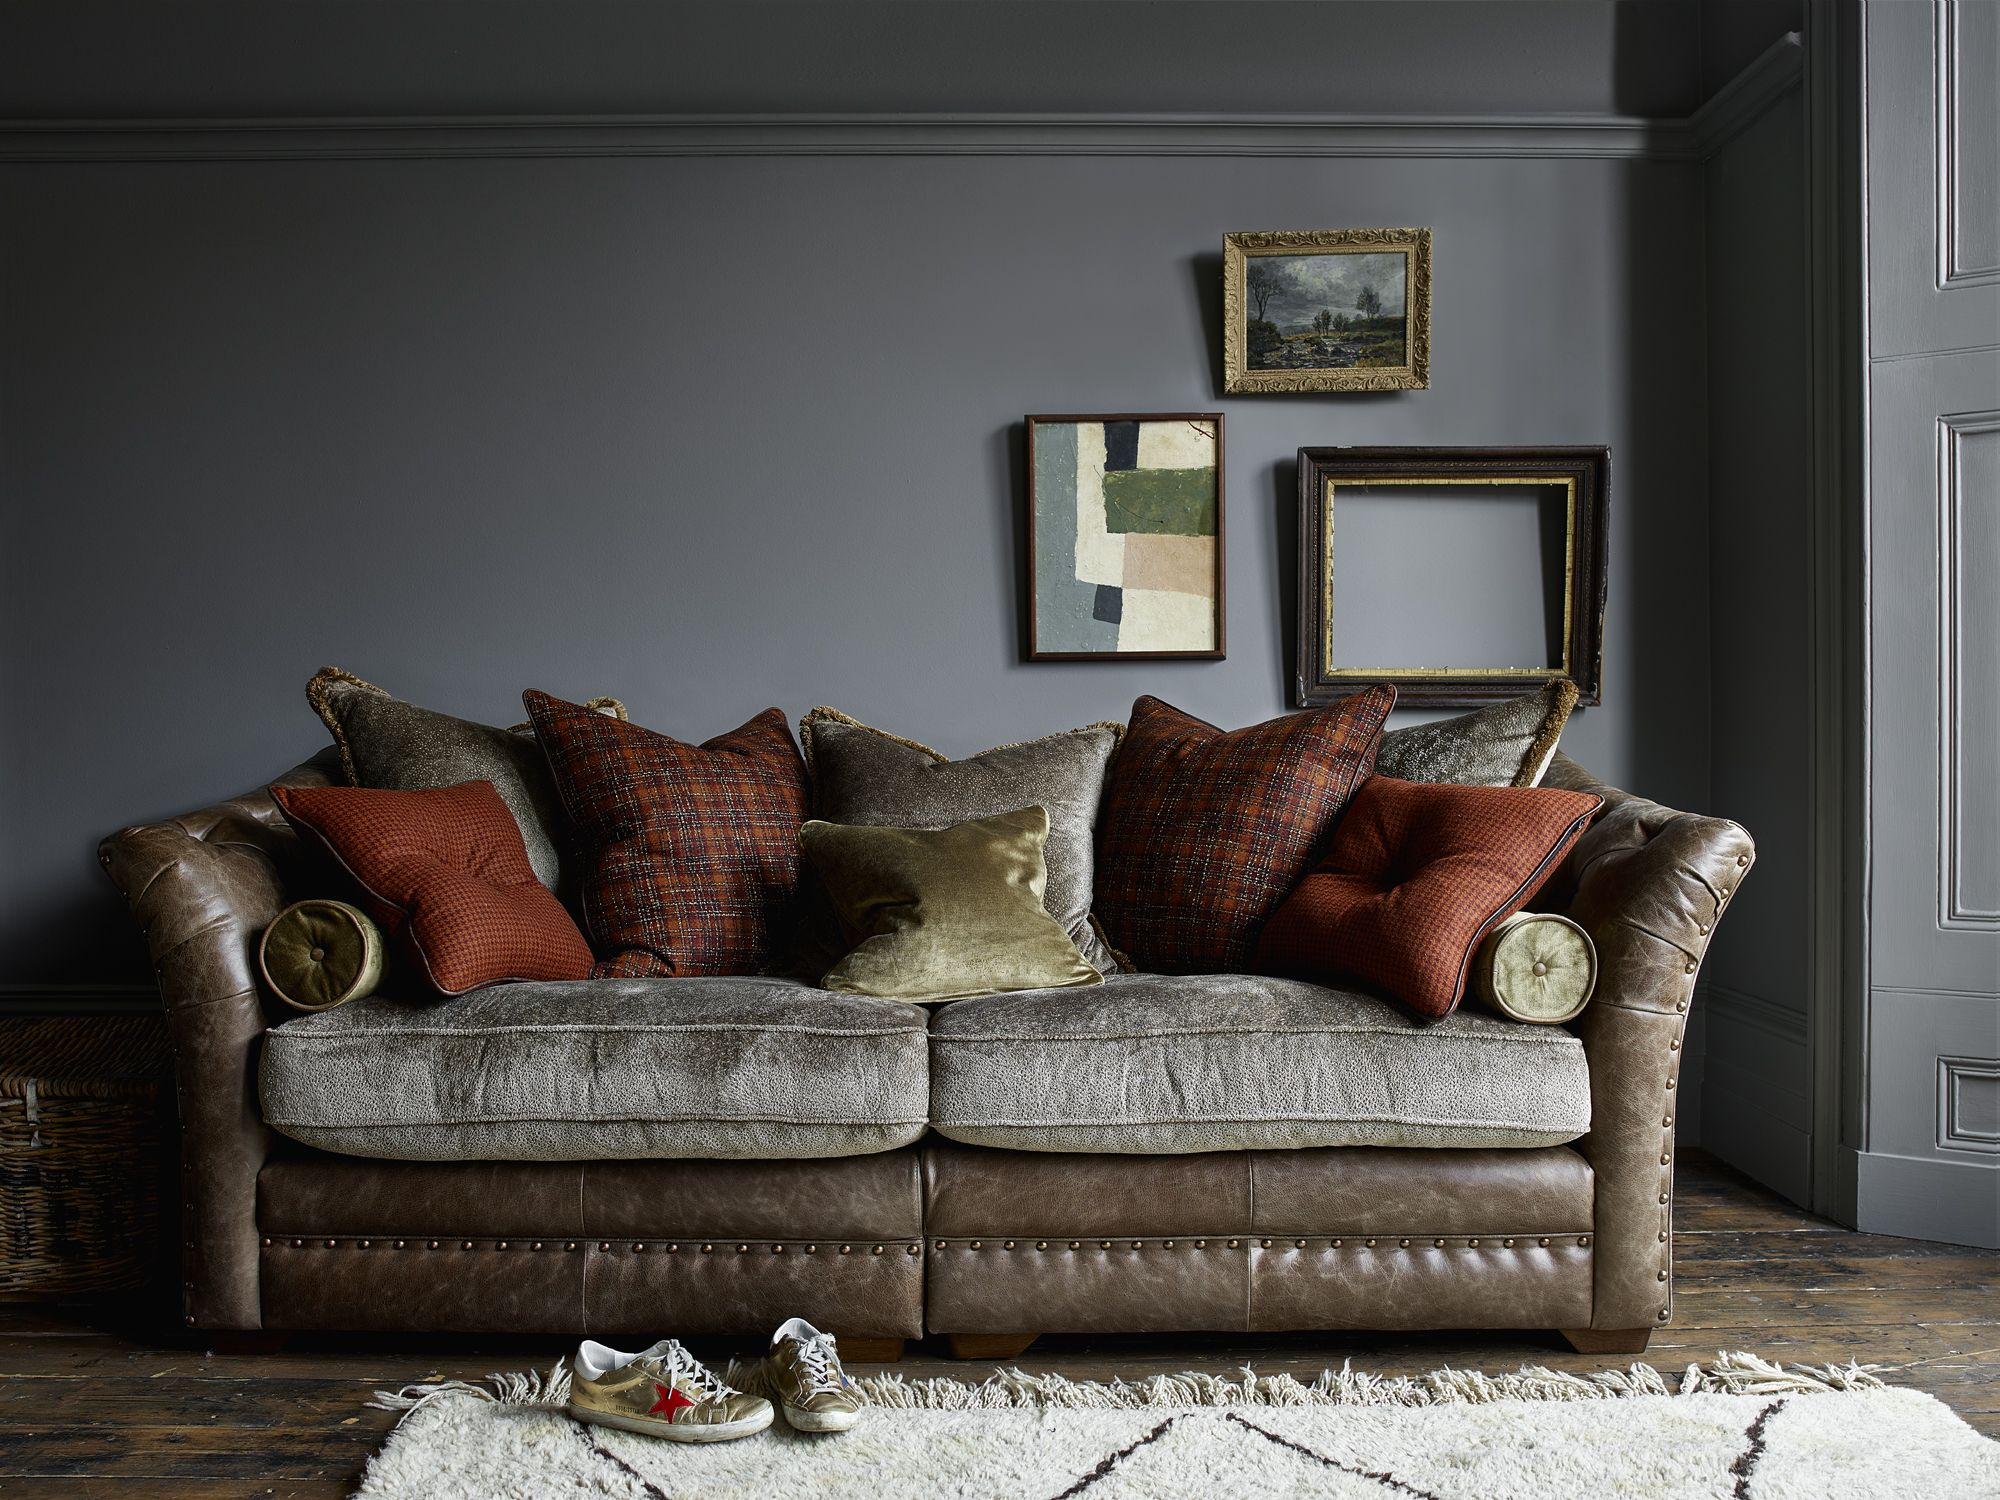 Alexander James Henderson Leather Velvet Sofa Snuggler Footstool Leathersofa Softvelvets Natur Comfortable Sofa British Sofa Sofa Design